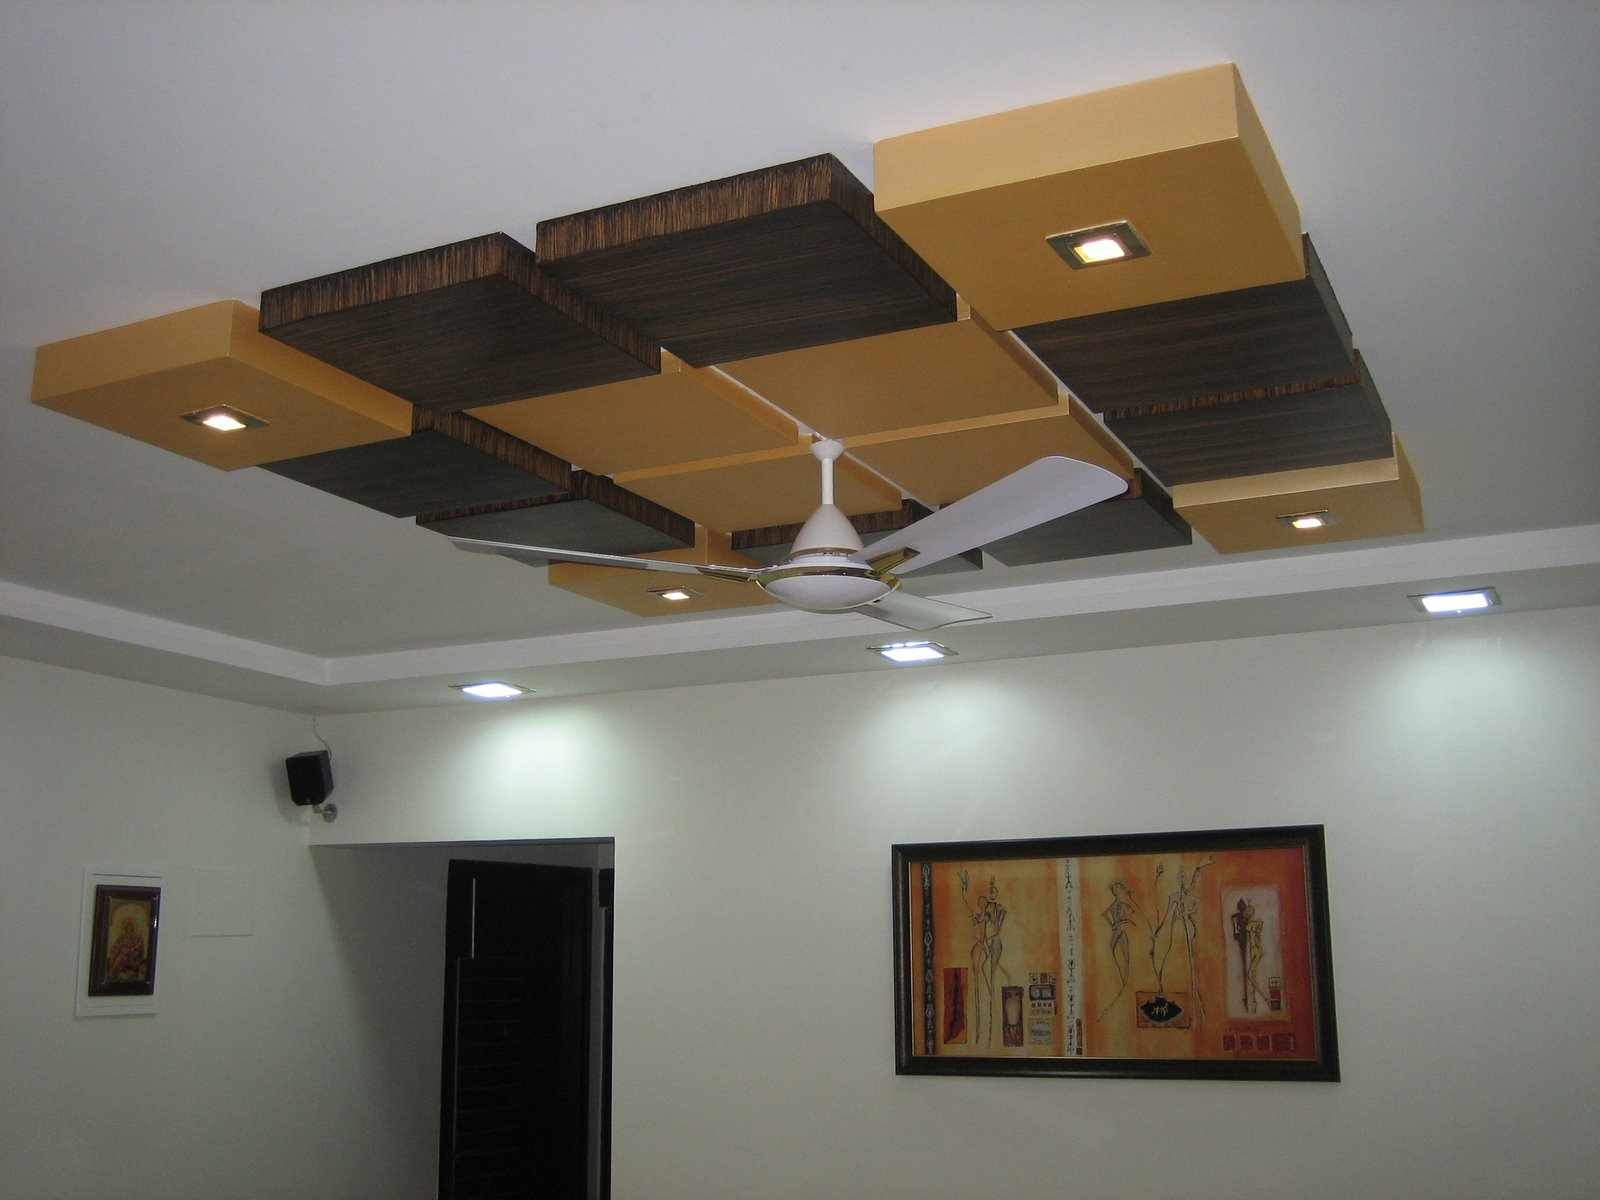 diy ceiling lights photo - 10